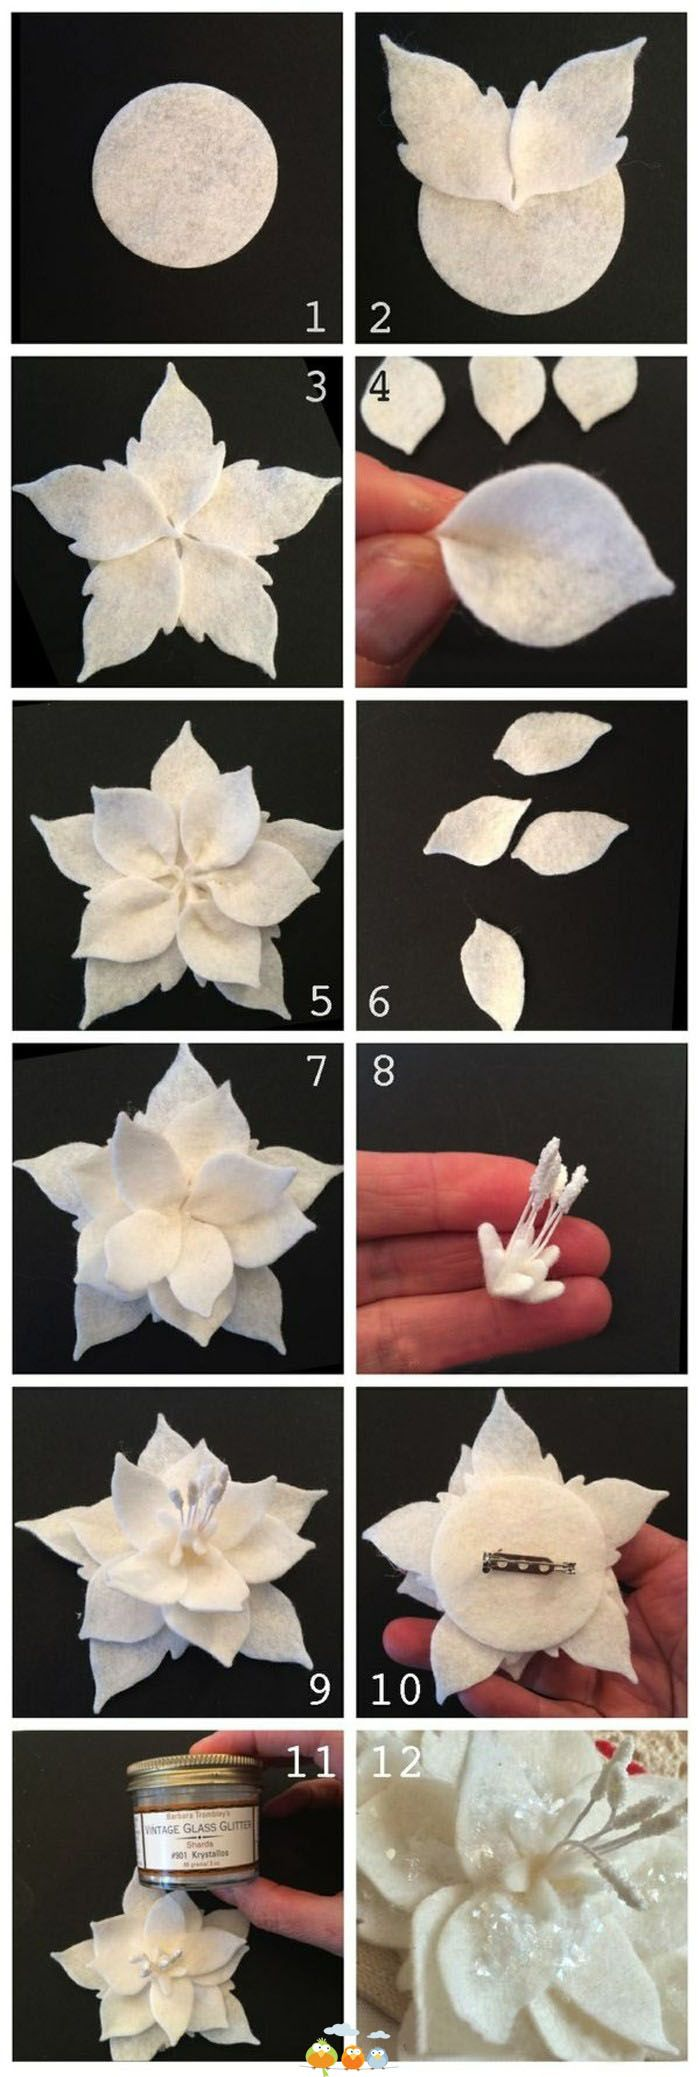 White poisenttia